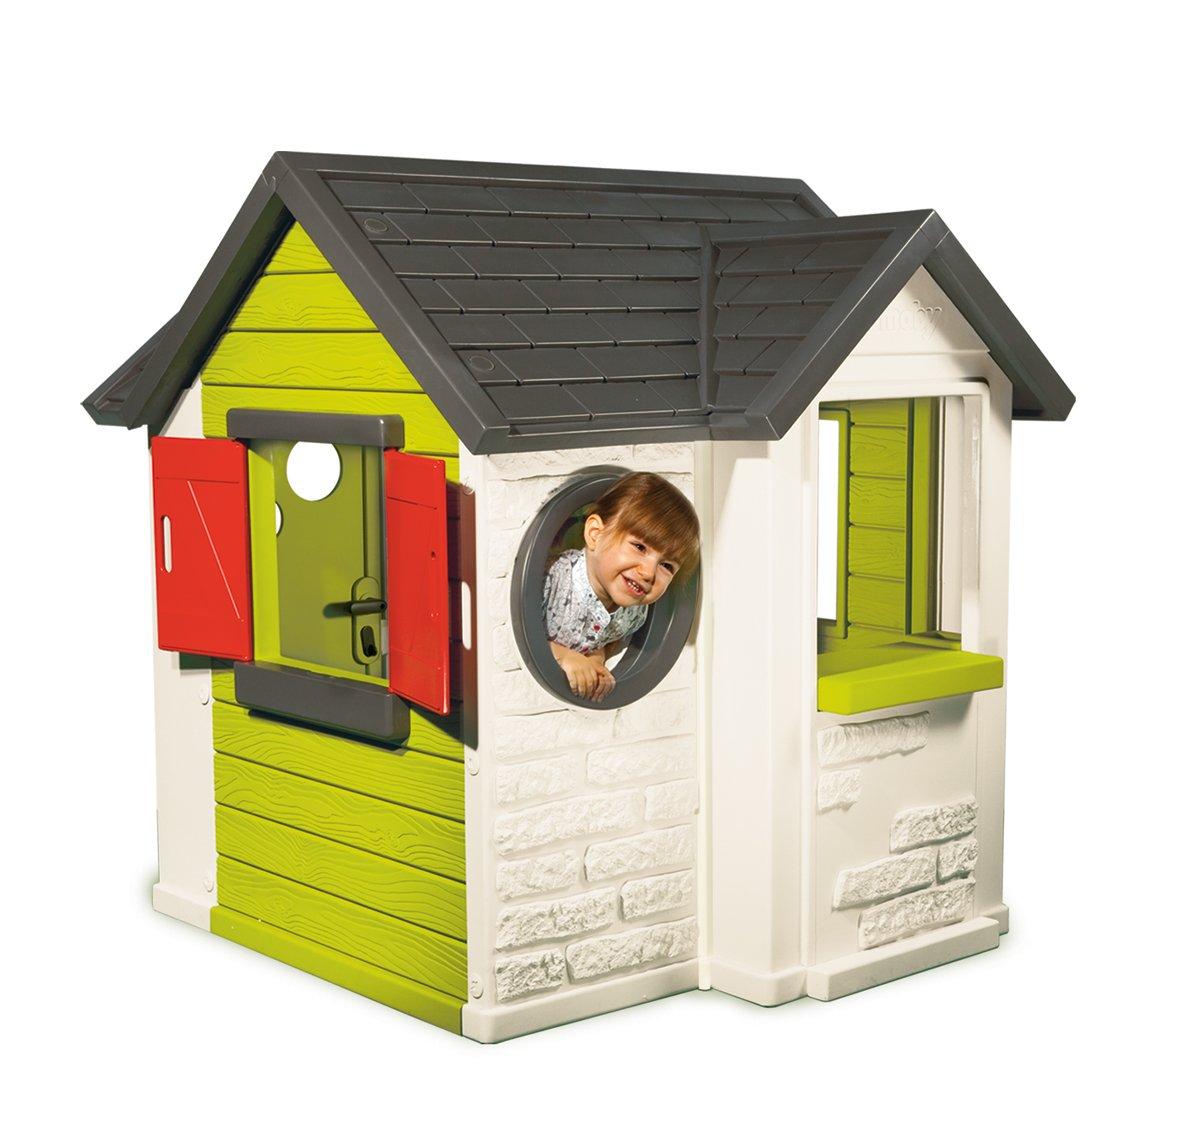 Smoby 310241 - Mein Haus: Amazon.de: Spielzeug